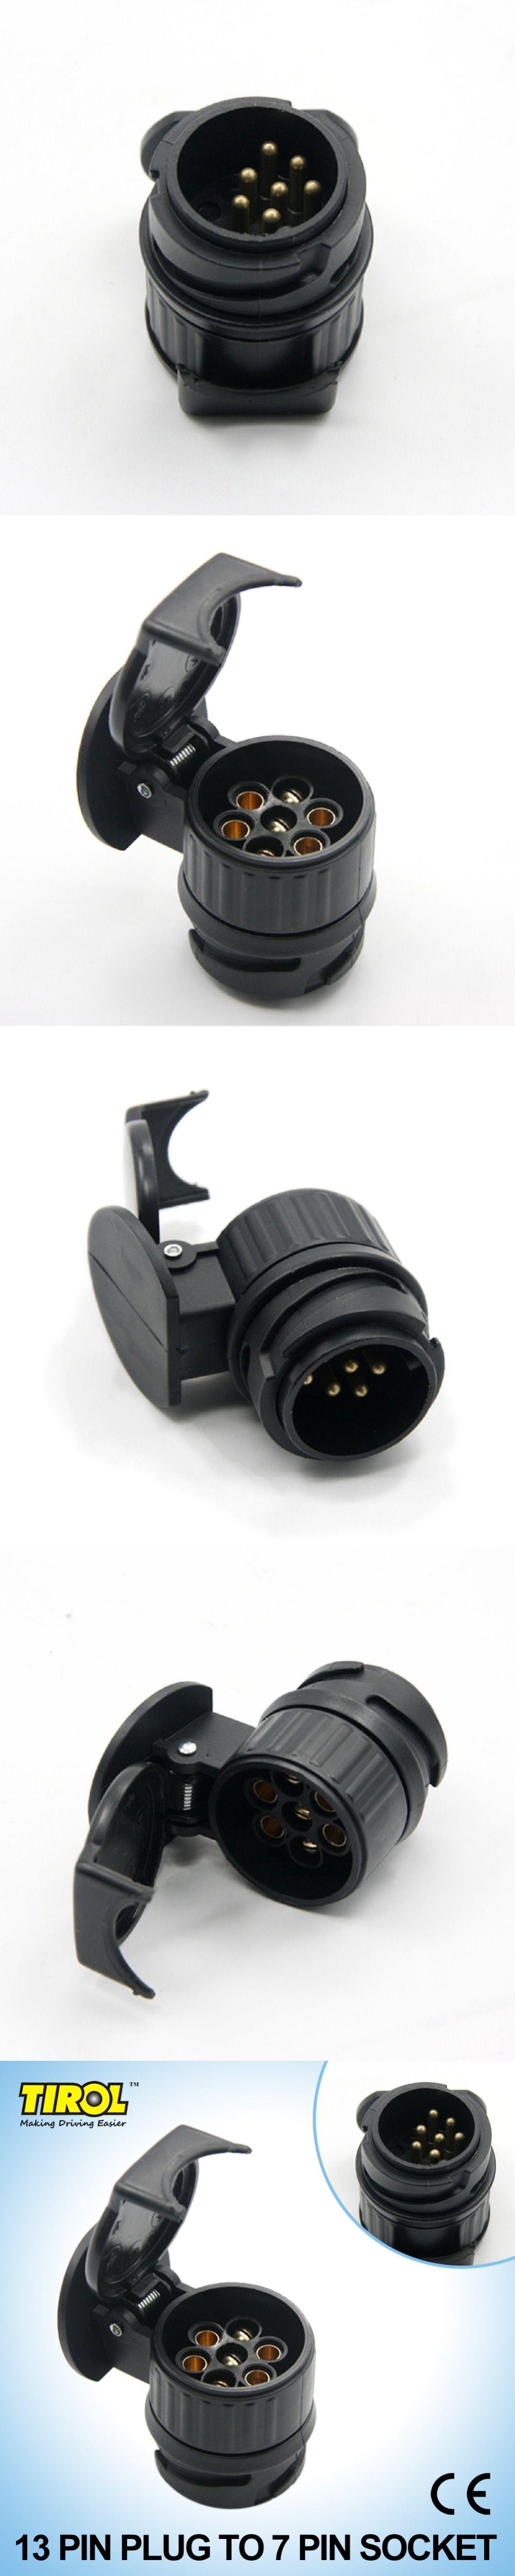 Tirol 13 To 7 Pin Trailer Adapter Black Plastic Wiring Towbar Socket Connector 12v Towing Plug